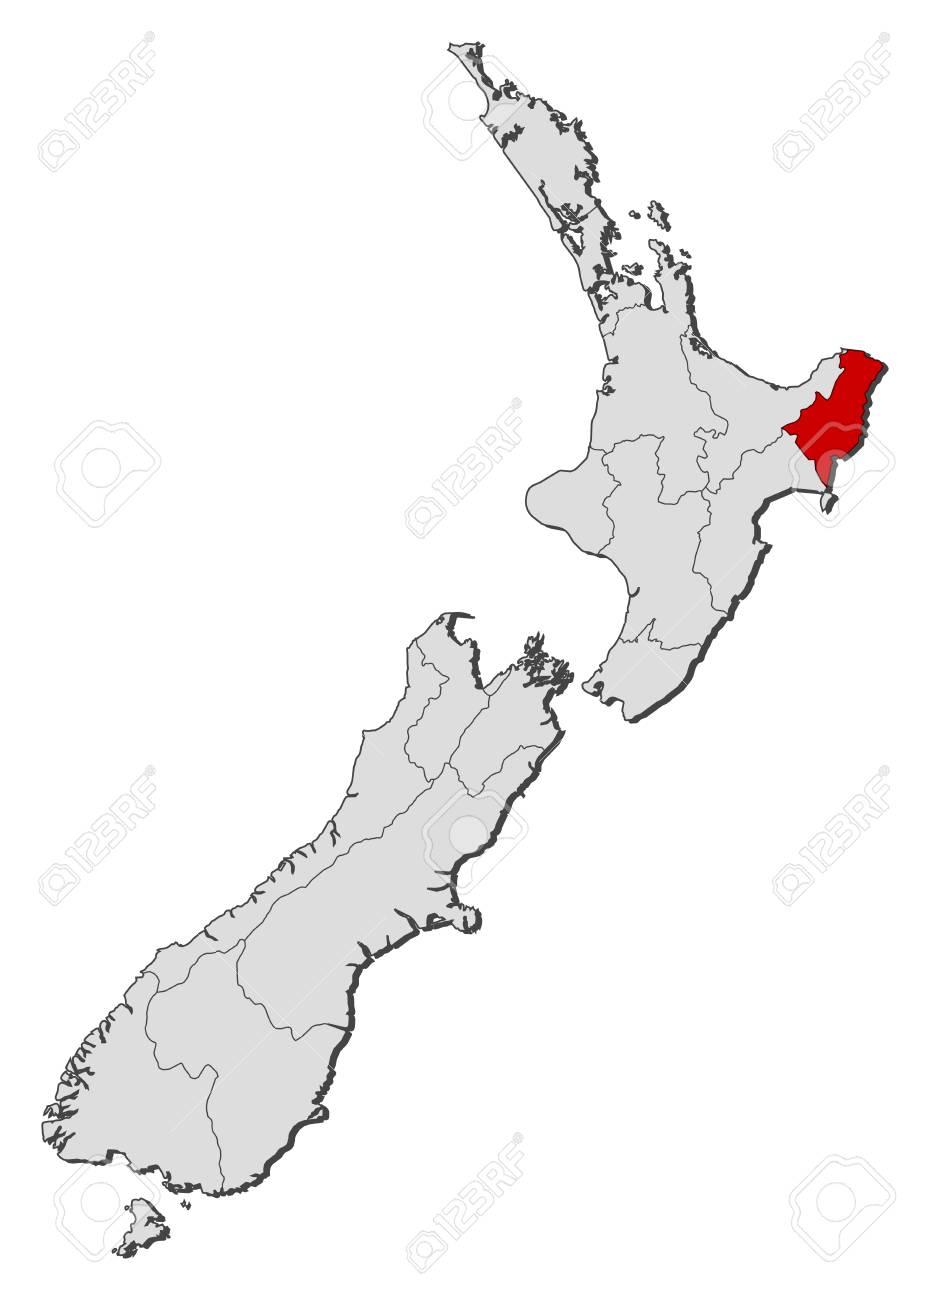 Map Gisborne New Zealand on bay of plenty new zealand map, marahau new zealand map, auckland new zealand map, mount ngauruhoe new zealand map, waiotapu new zealand map, mount ruapehu new zealand map, piha new zealand map, waikato new zealand map, franz josef glacier new zealand map, lake pukaki new zealand map, hot water beach new zealand map, manukau new zealand map, mount taranaki new zealand map, broadmeadows new zealand map, bay of islands new zealand map, dunedin new zealand map, queen charlotte sound new zealand map, feilding new zealand map, chatham islands new zealand map,